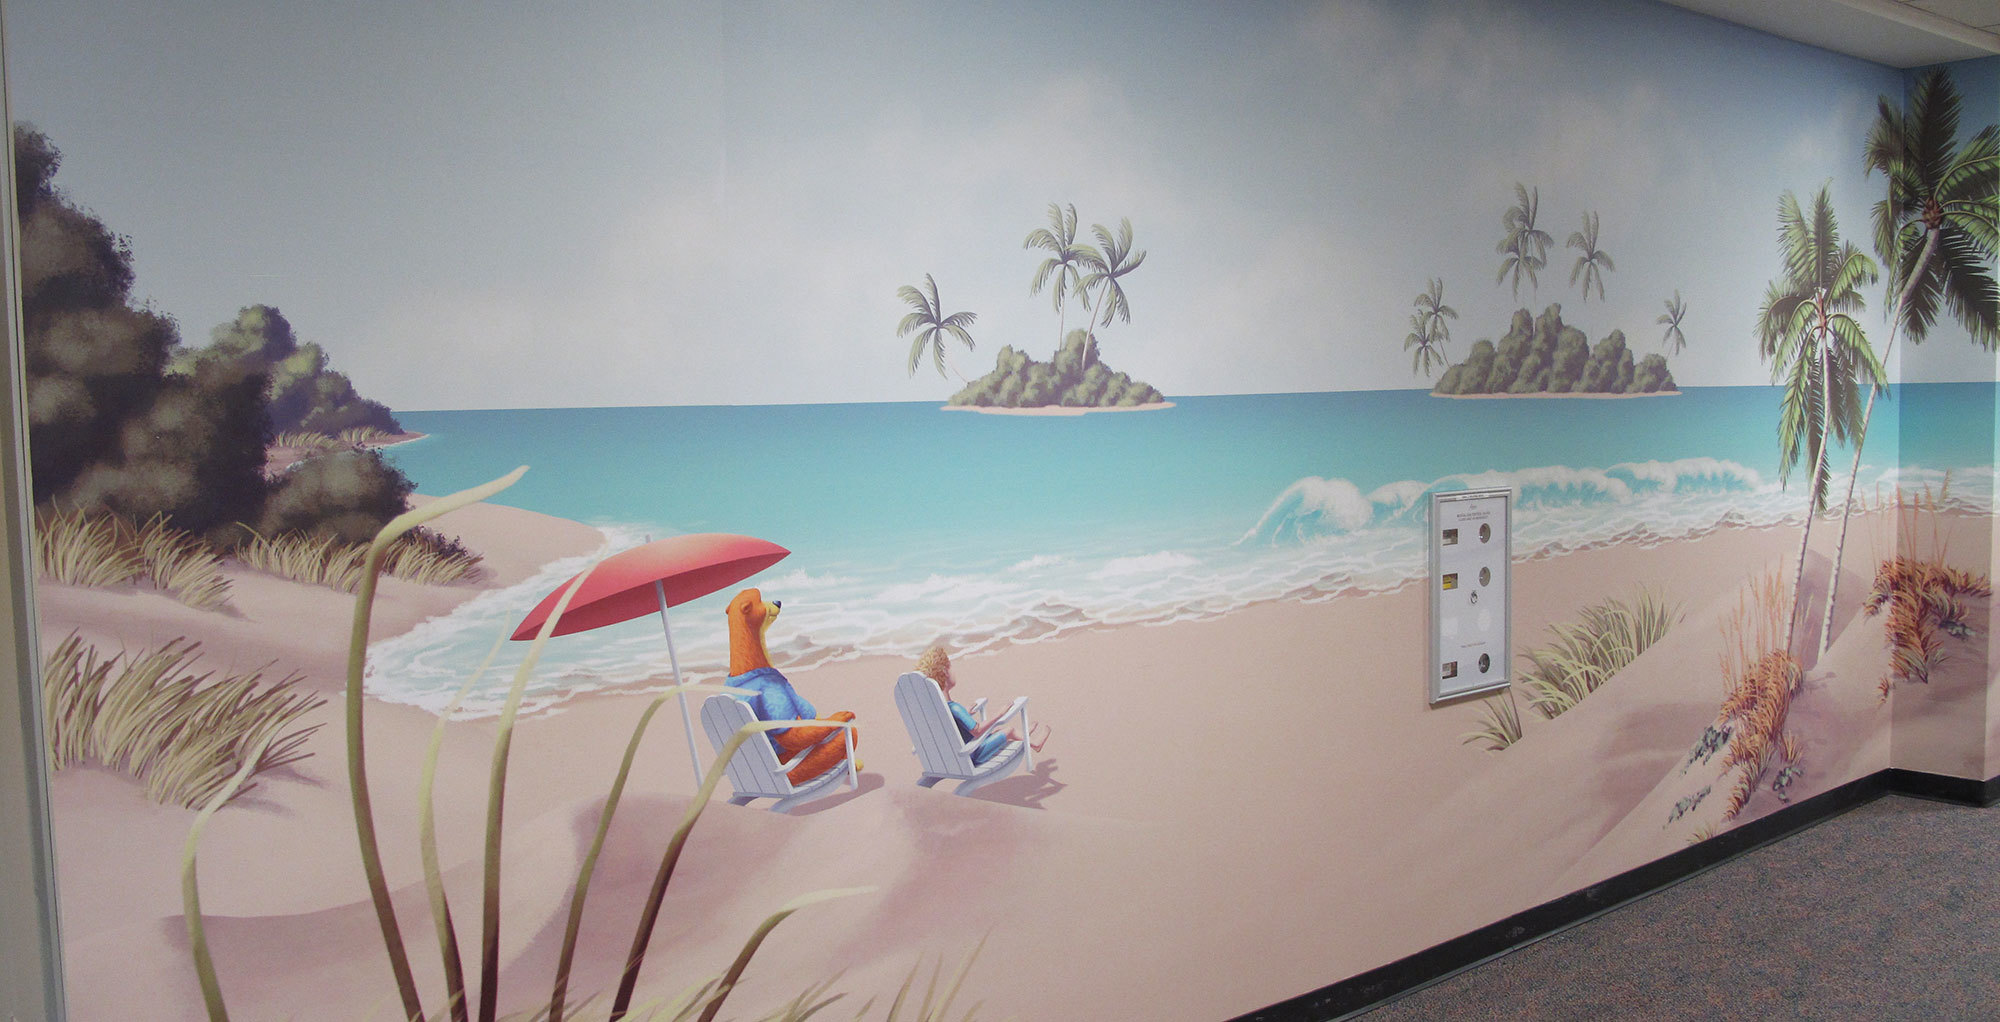 Beach Themed Wall Covering at Celebration Health Florida Hospital